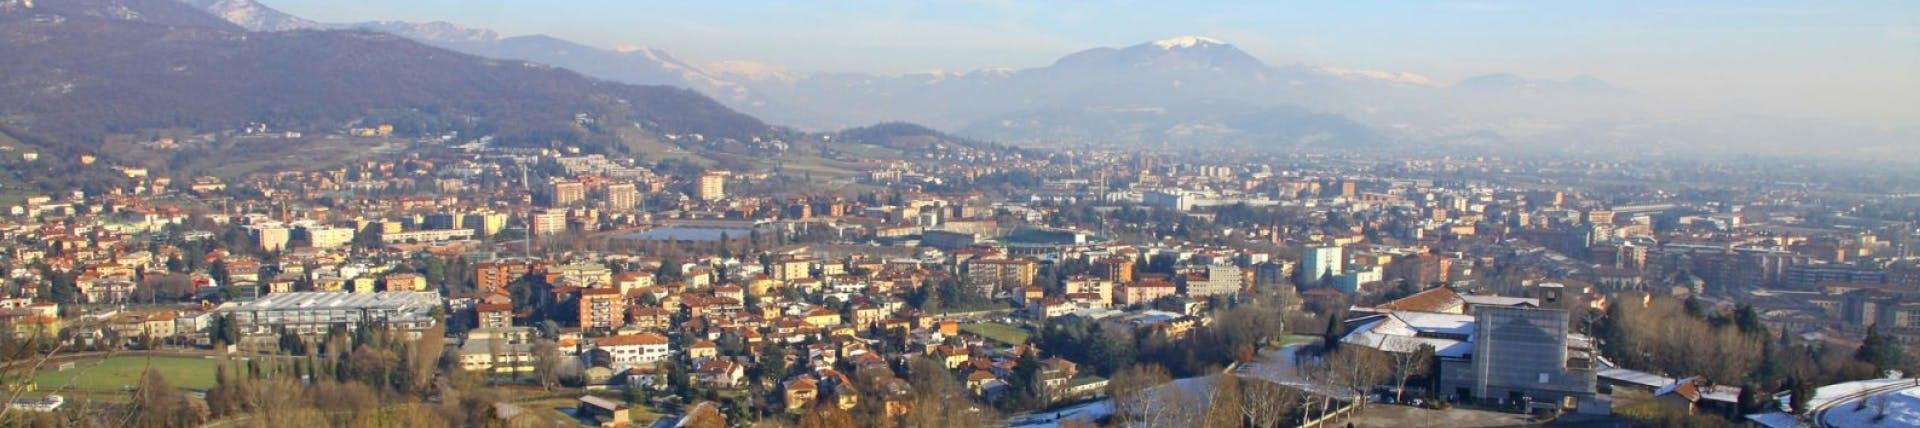 Picture of Bergamo